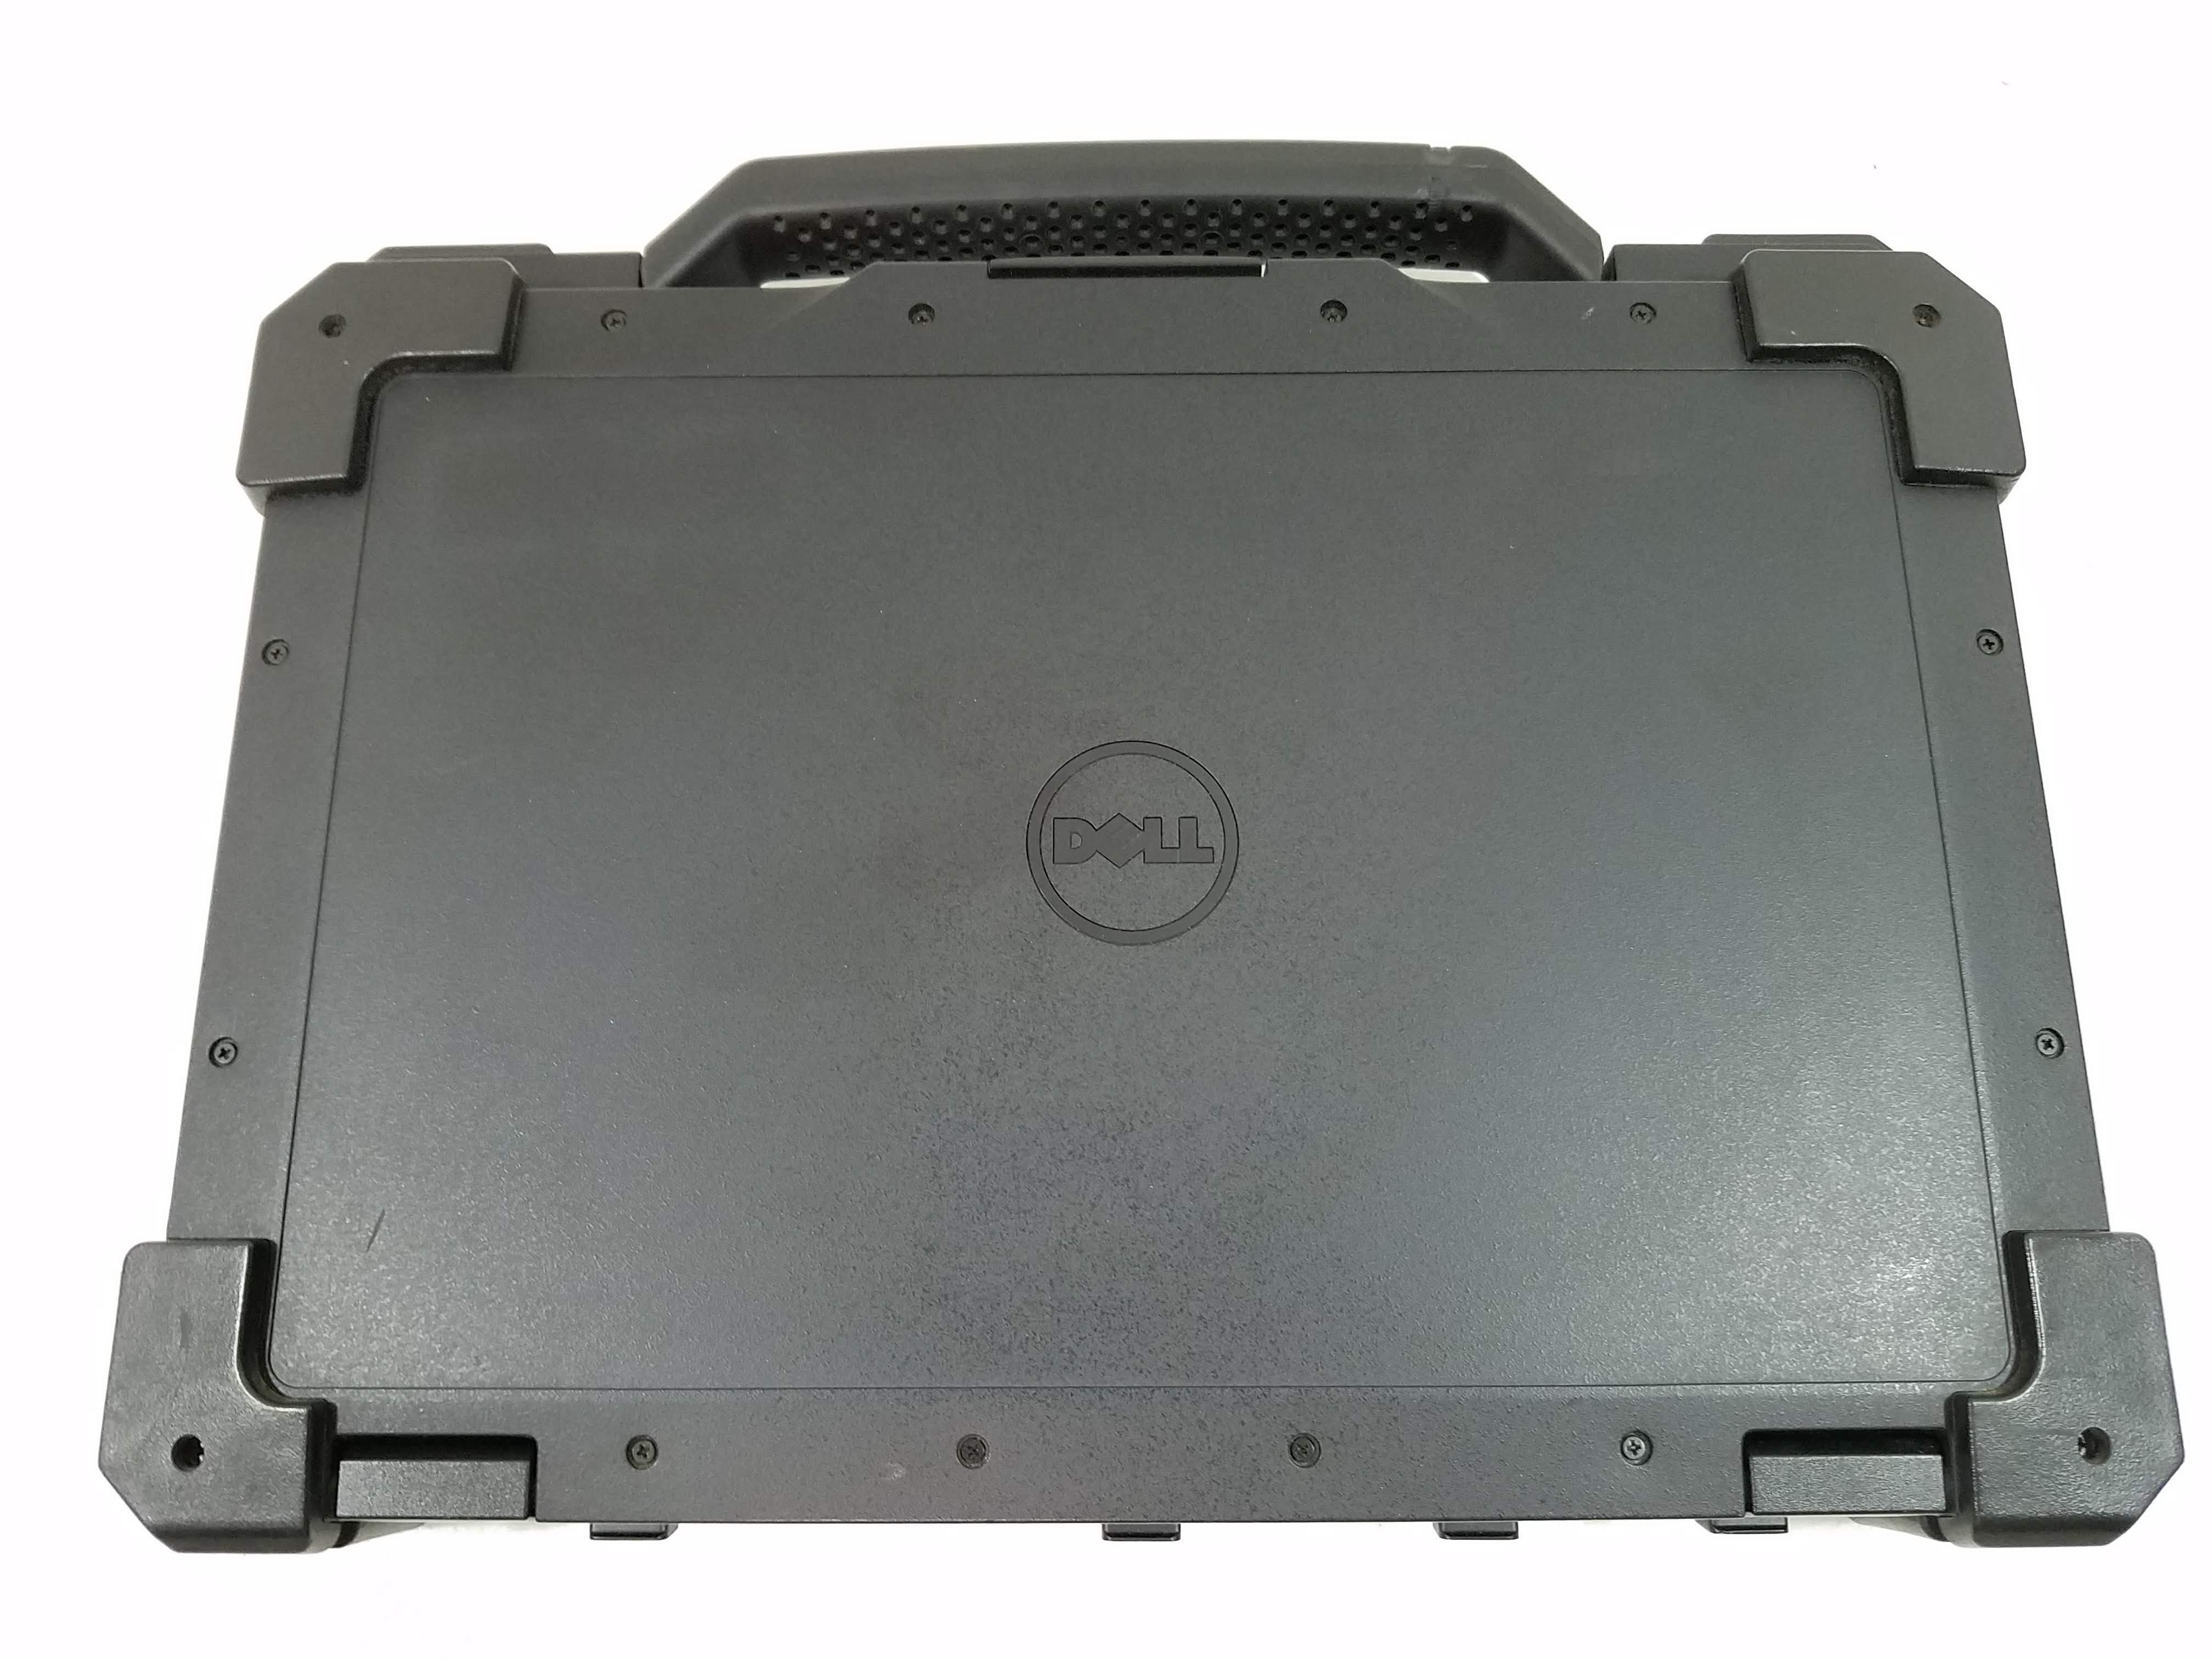 Dell Latitude 7414 Rugged Extreme I7 6600u 32gb Ram 512gb